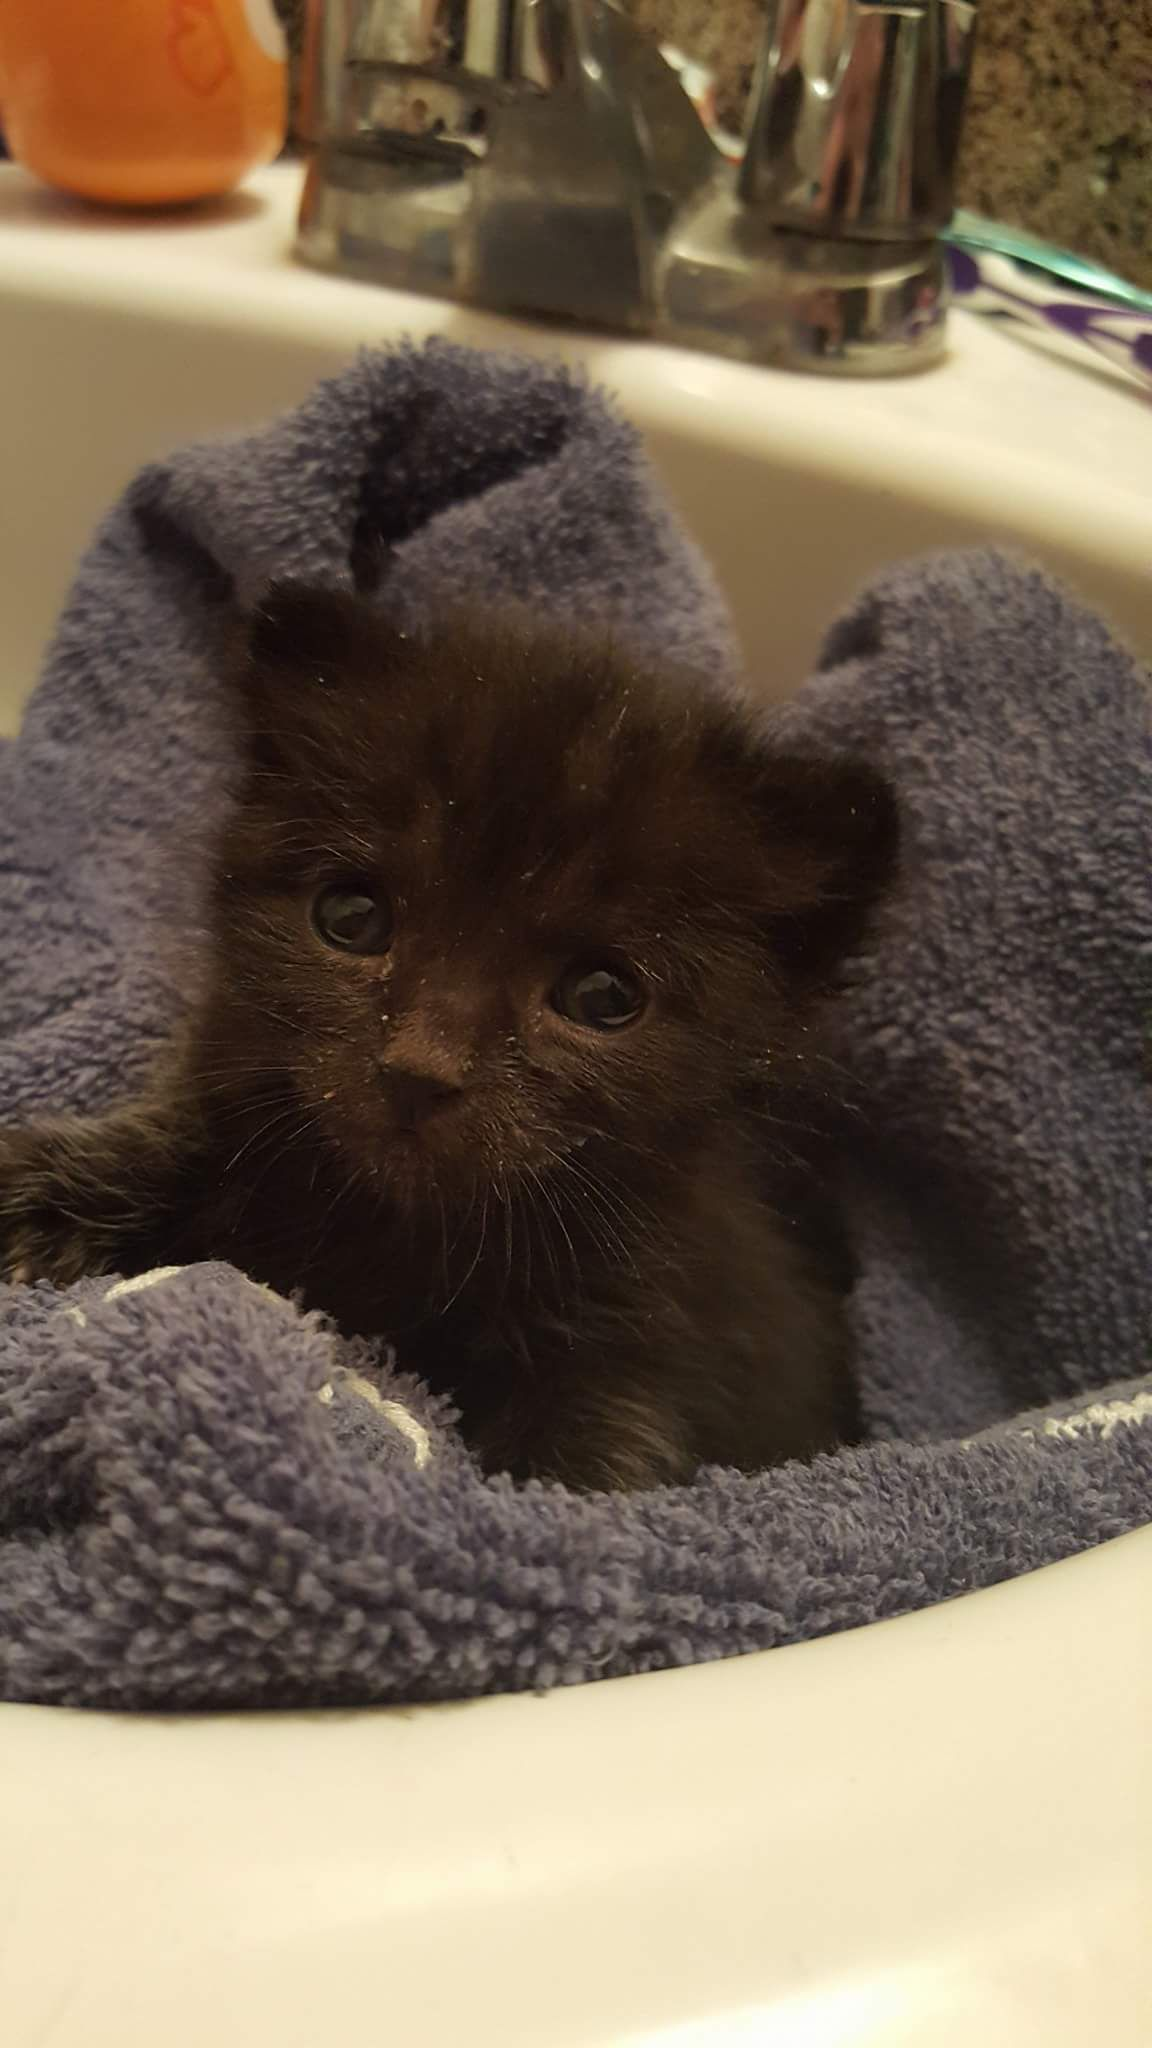 Girlfriend Wanted To Rescue A Kitten I Said No Meet My New Kitten Rafiki Http Ift Tt 2obl6z8 Kitten Rescue Cute Animal Pictures Baby Dogs